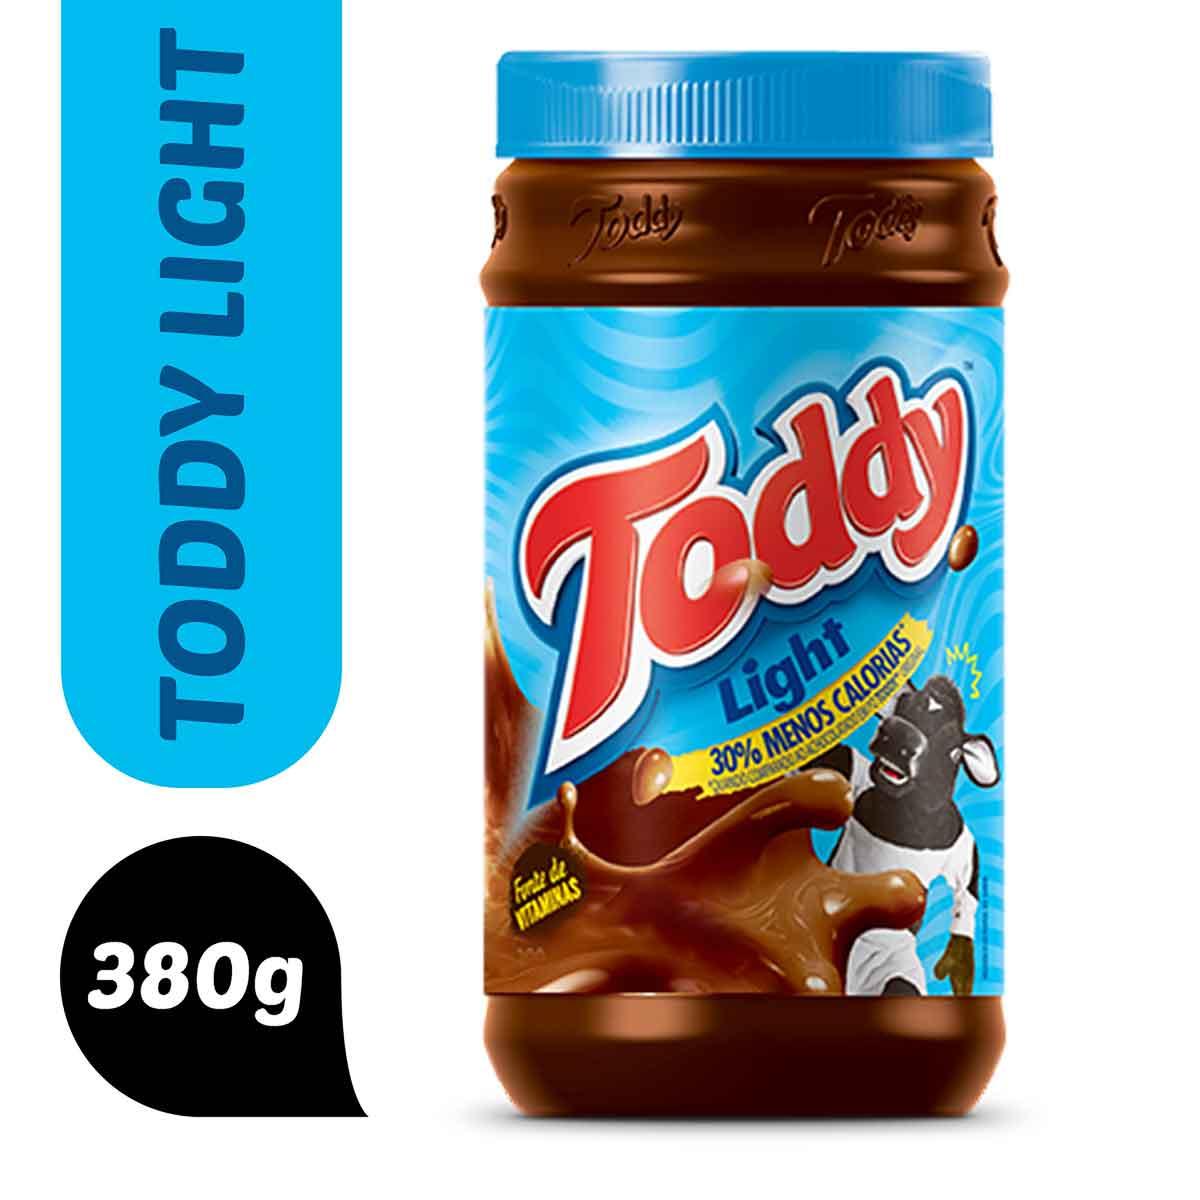 TODDY CHOCOLATE LIGHT 1X380G (24)